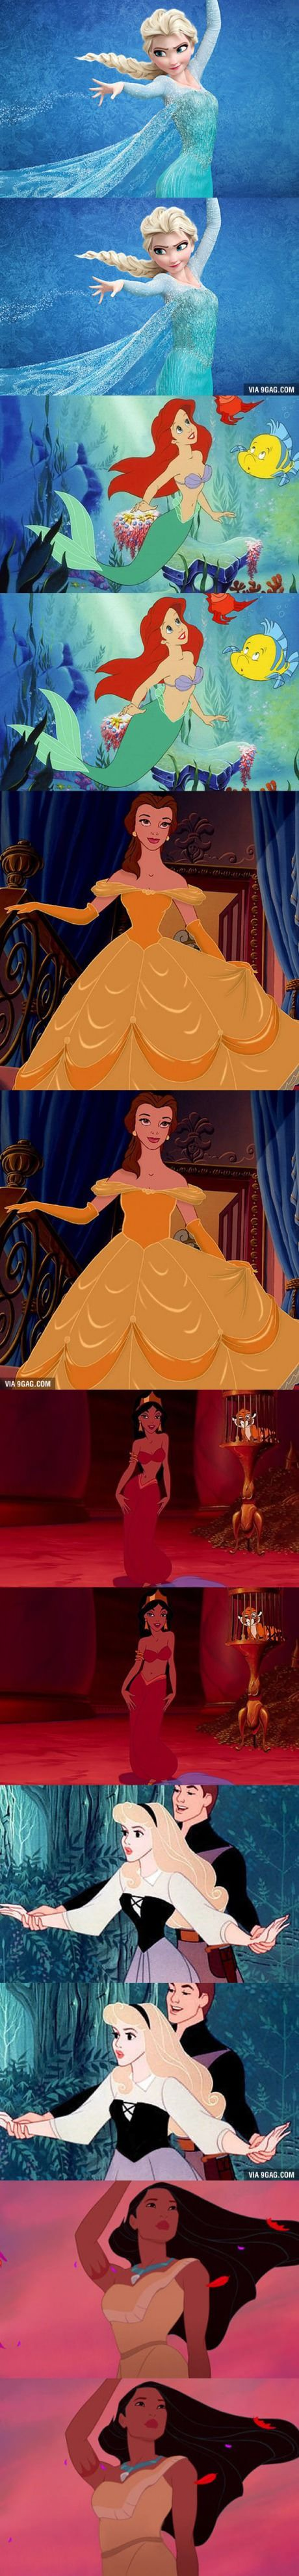 If Disney Princesses Had Realistic Waistlines. The originals look ridiculous now.